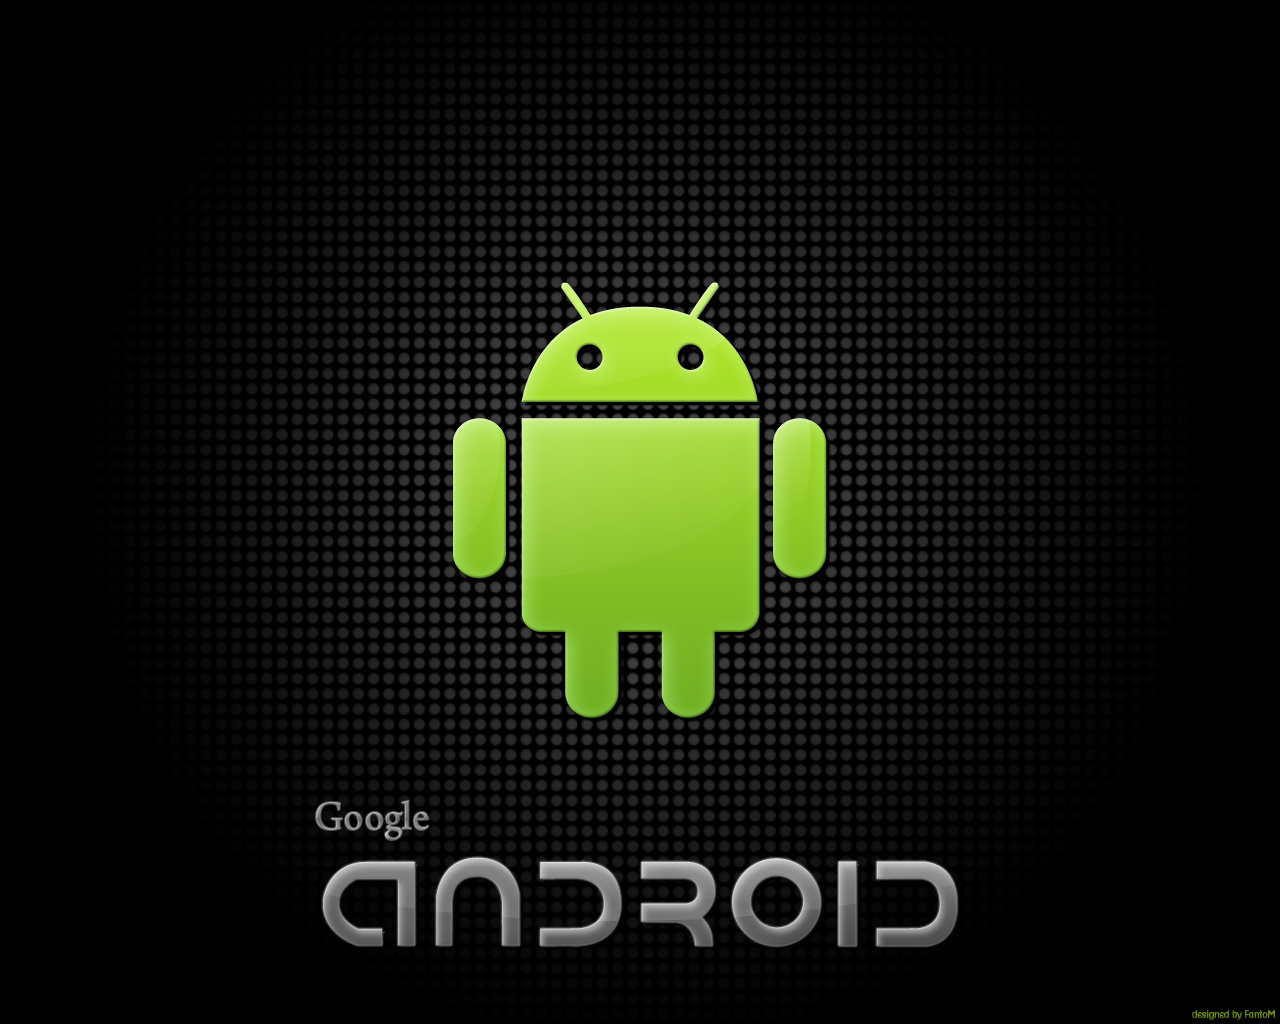 Android wallpaper desktop 6 hd desktop wallpapersjpg 1280x1024